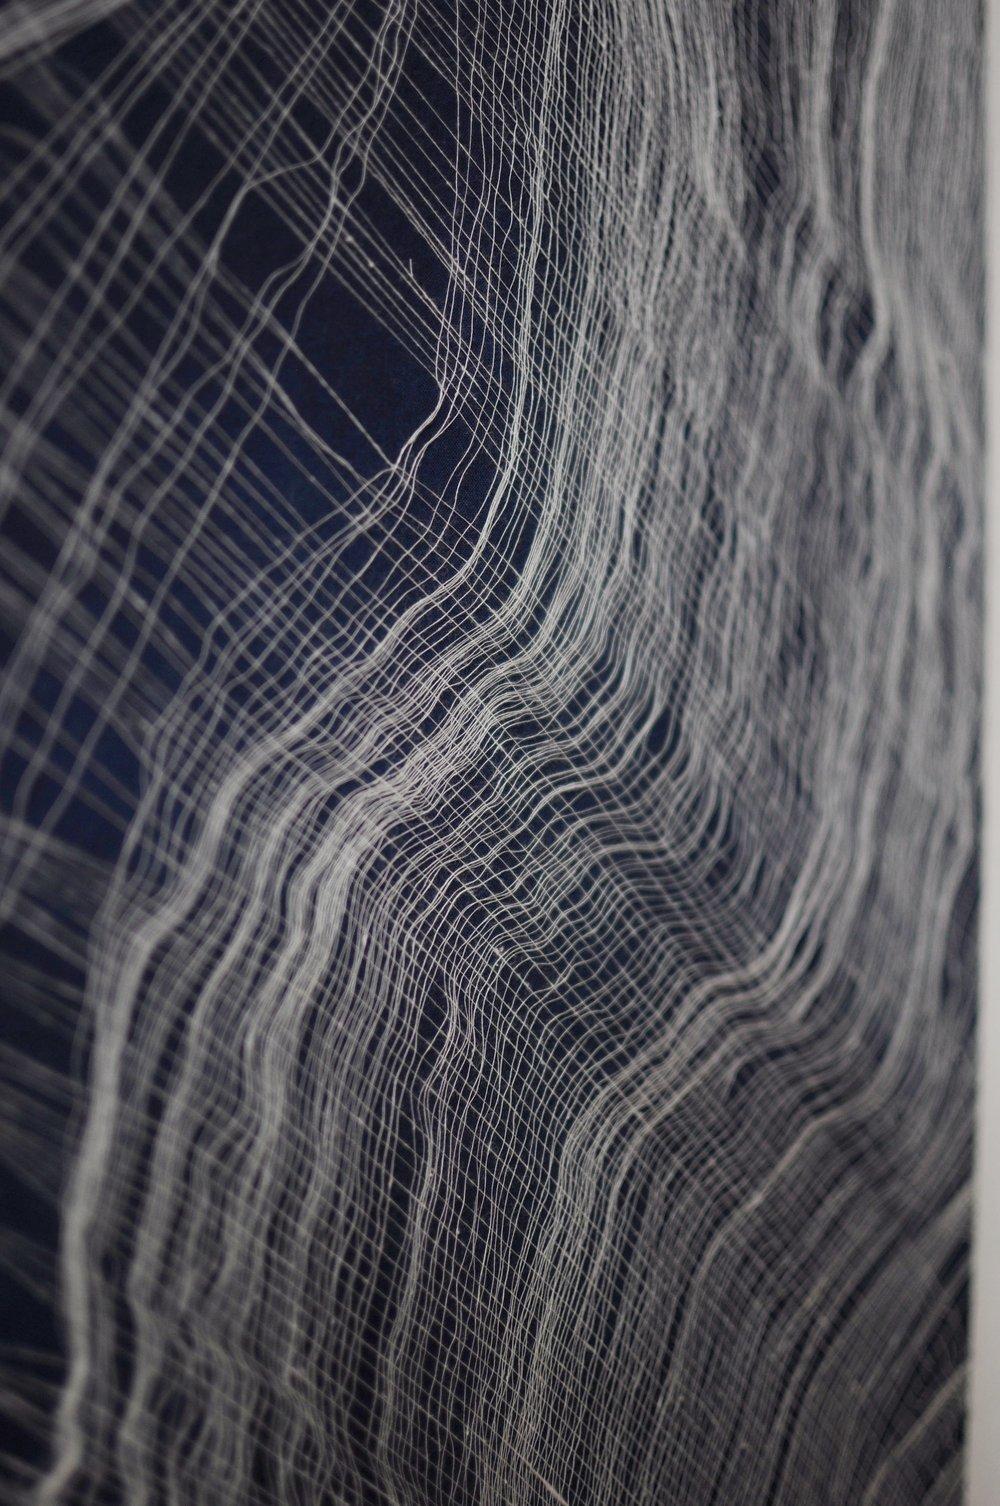 Morphology I , 2015 Woven Cotton and Indigofera  Alexander Sebastianus & Dori Badics 2015